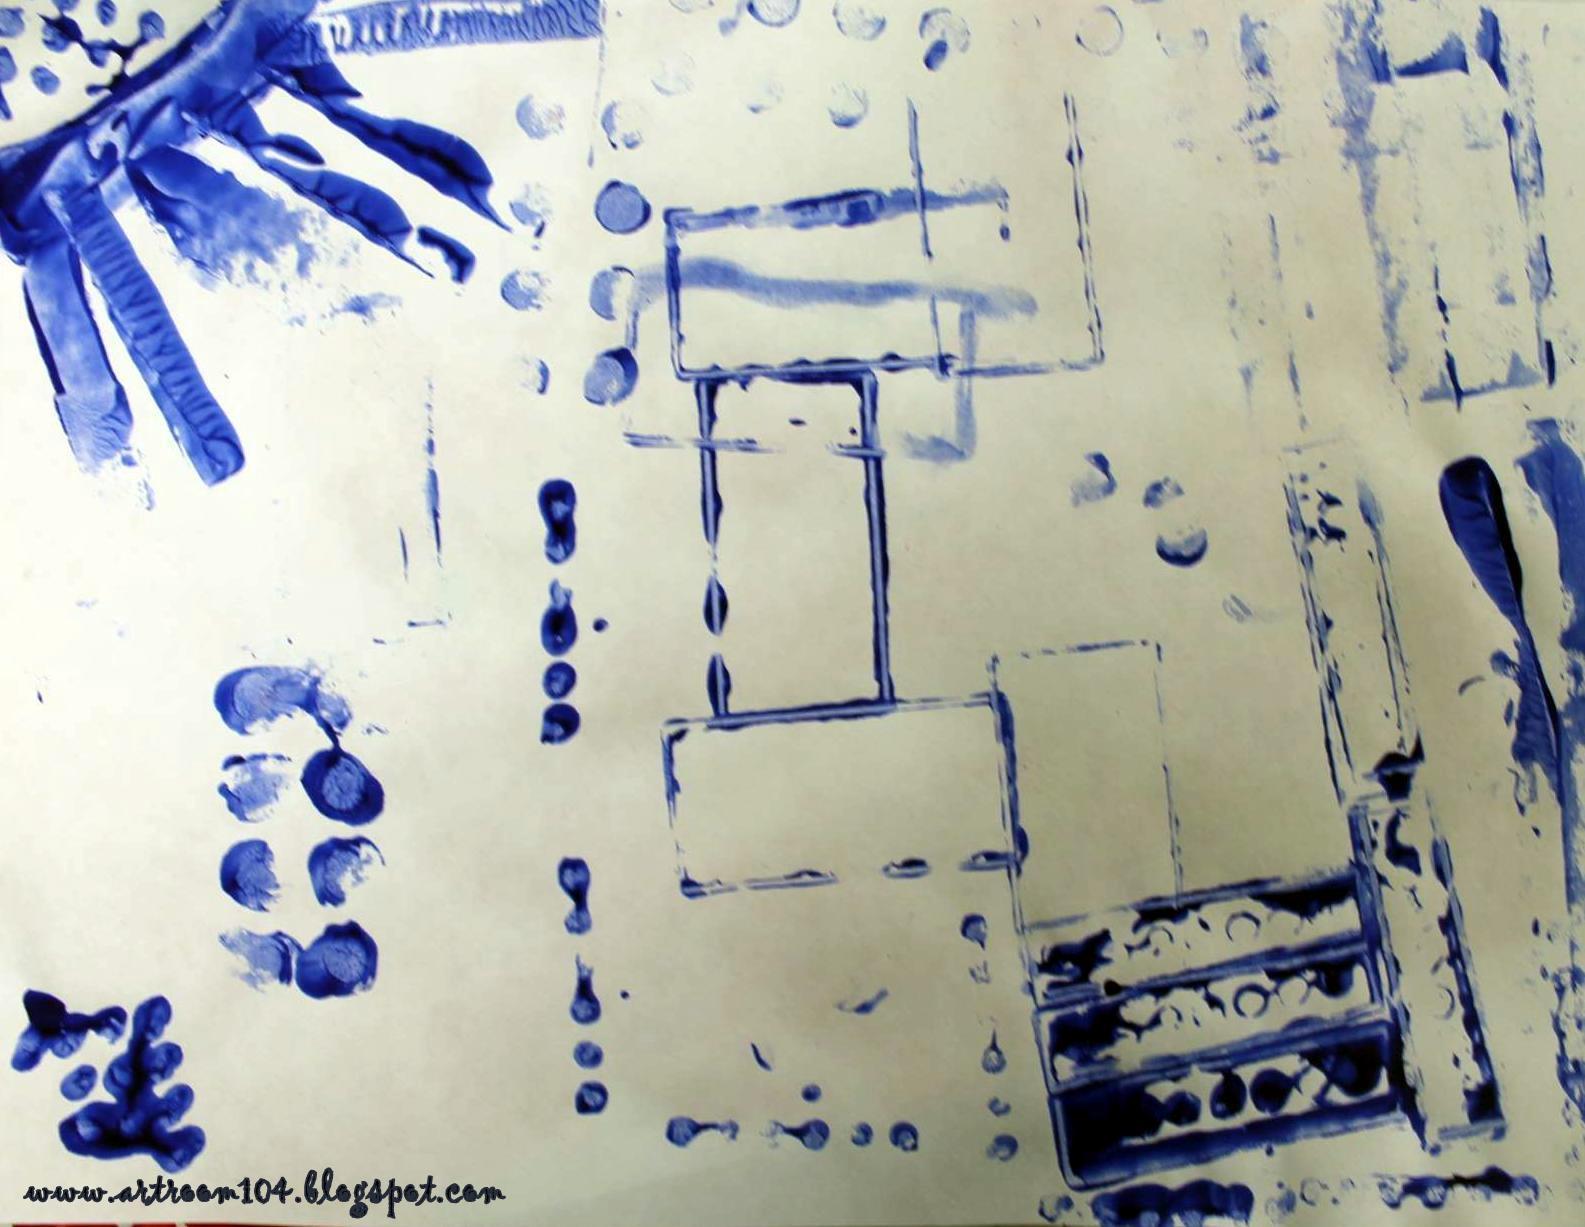 Art Room 104 2nd Grade Printmaking Unit Introduction to Printmaking